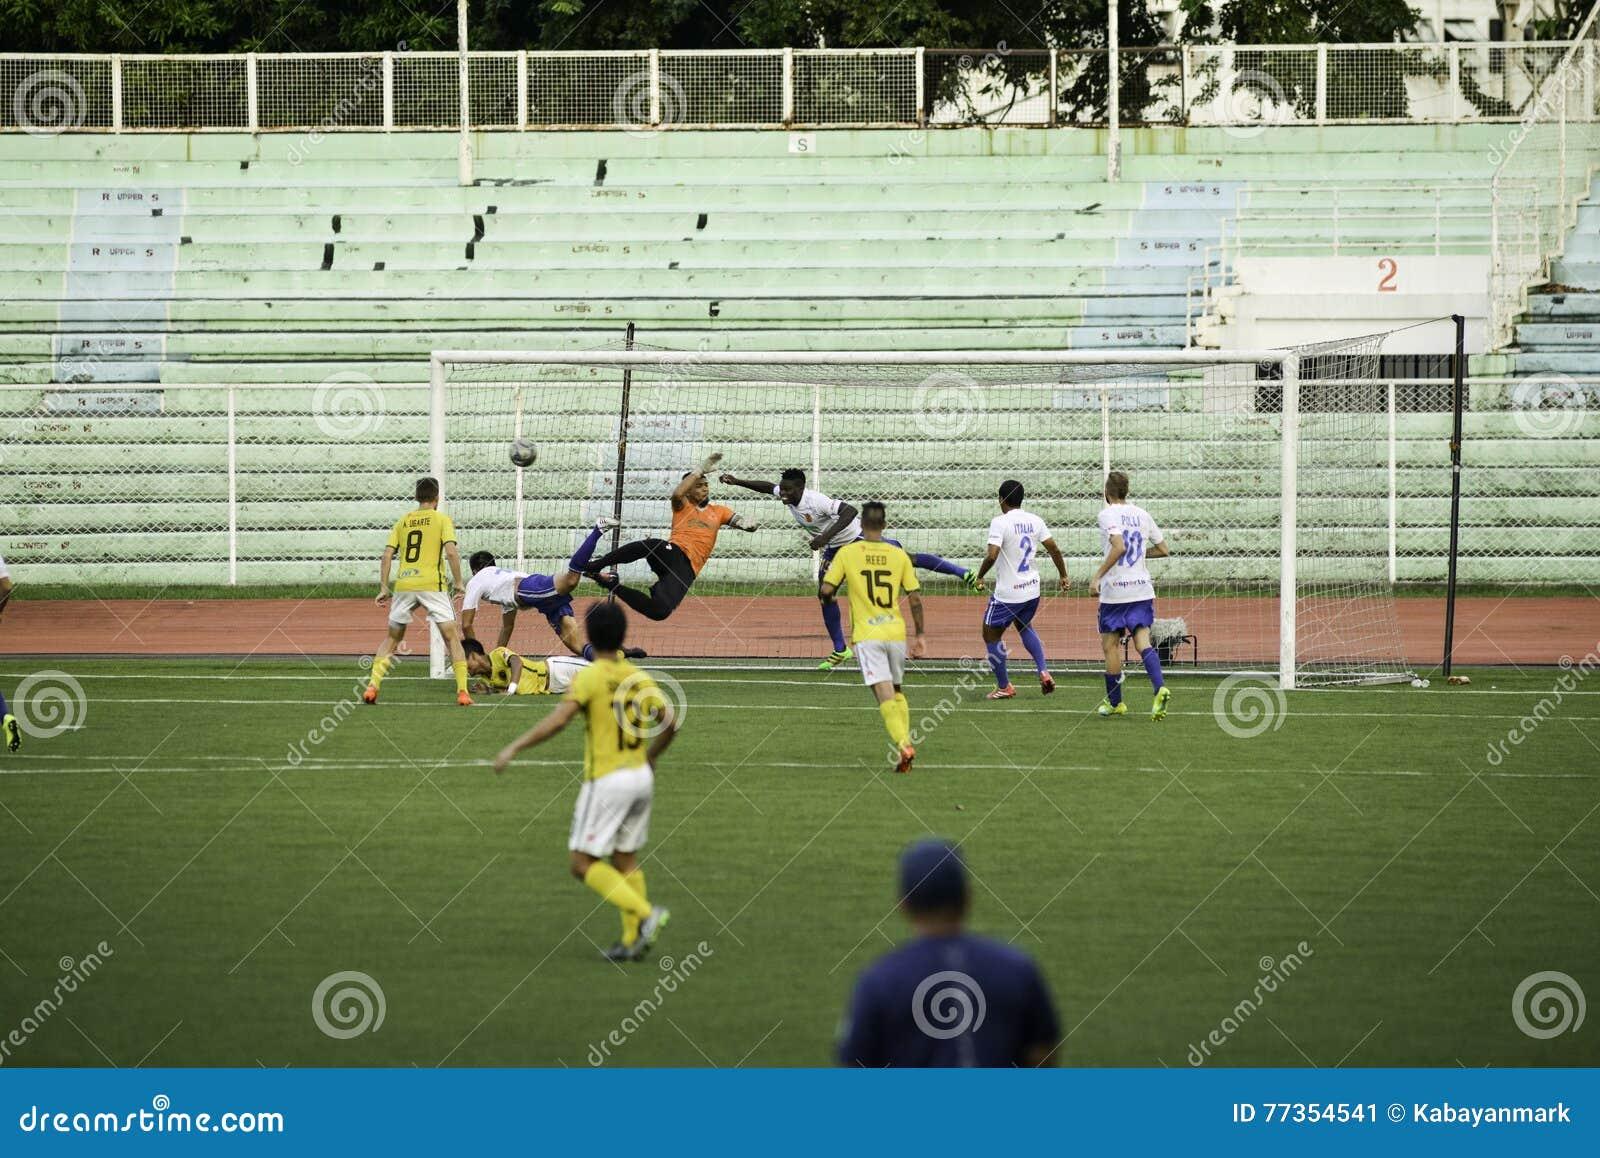 Scored Goal Kaya vs Stallions - Manila Football United League Philippines